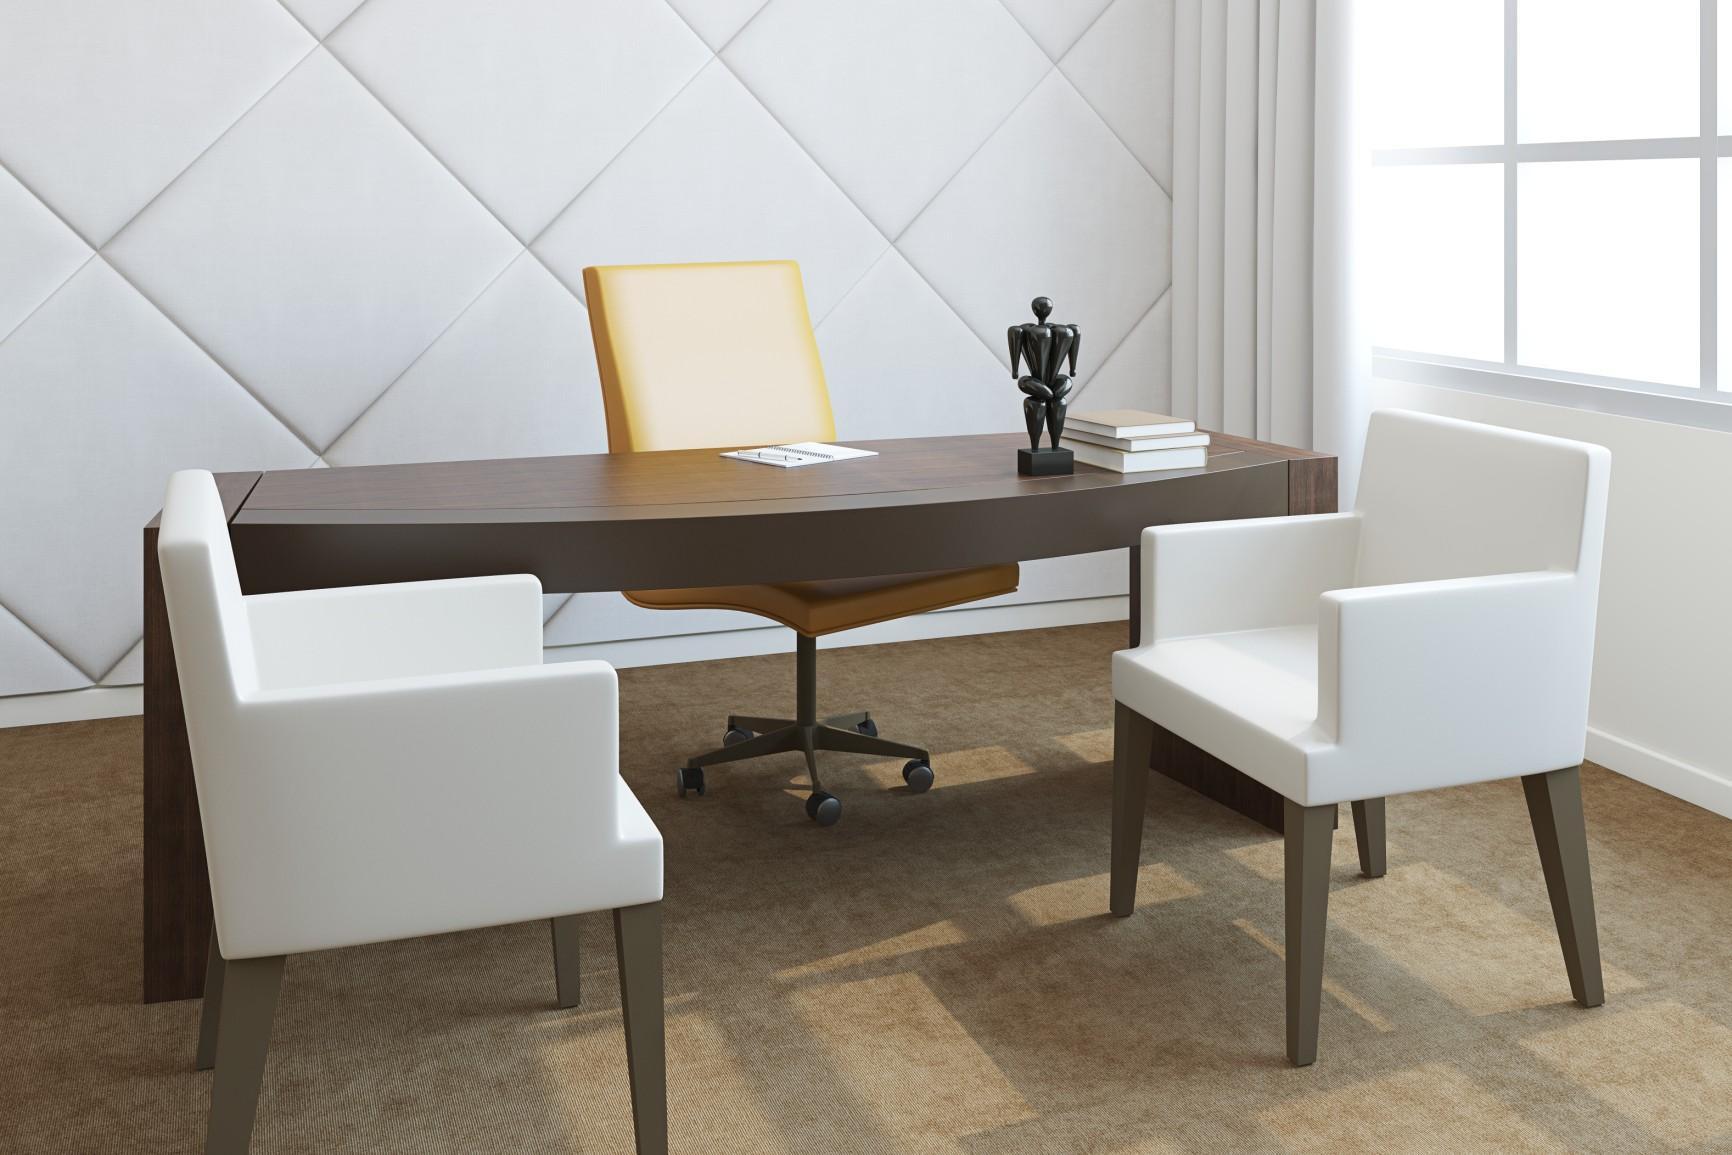 Arredamento studio professionale for Arredamento moderno casa